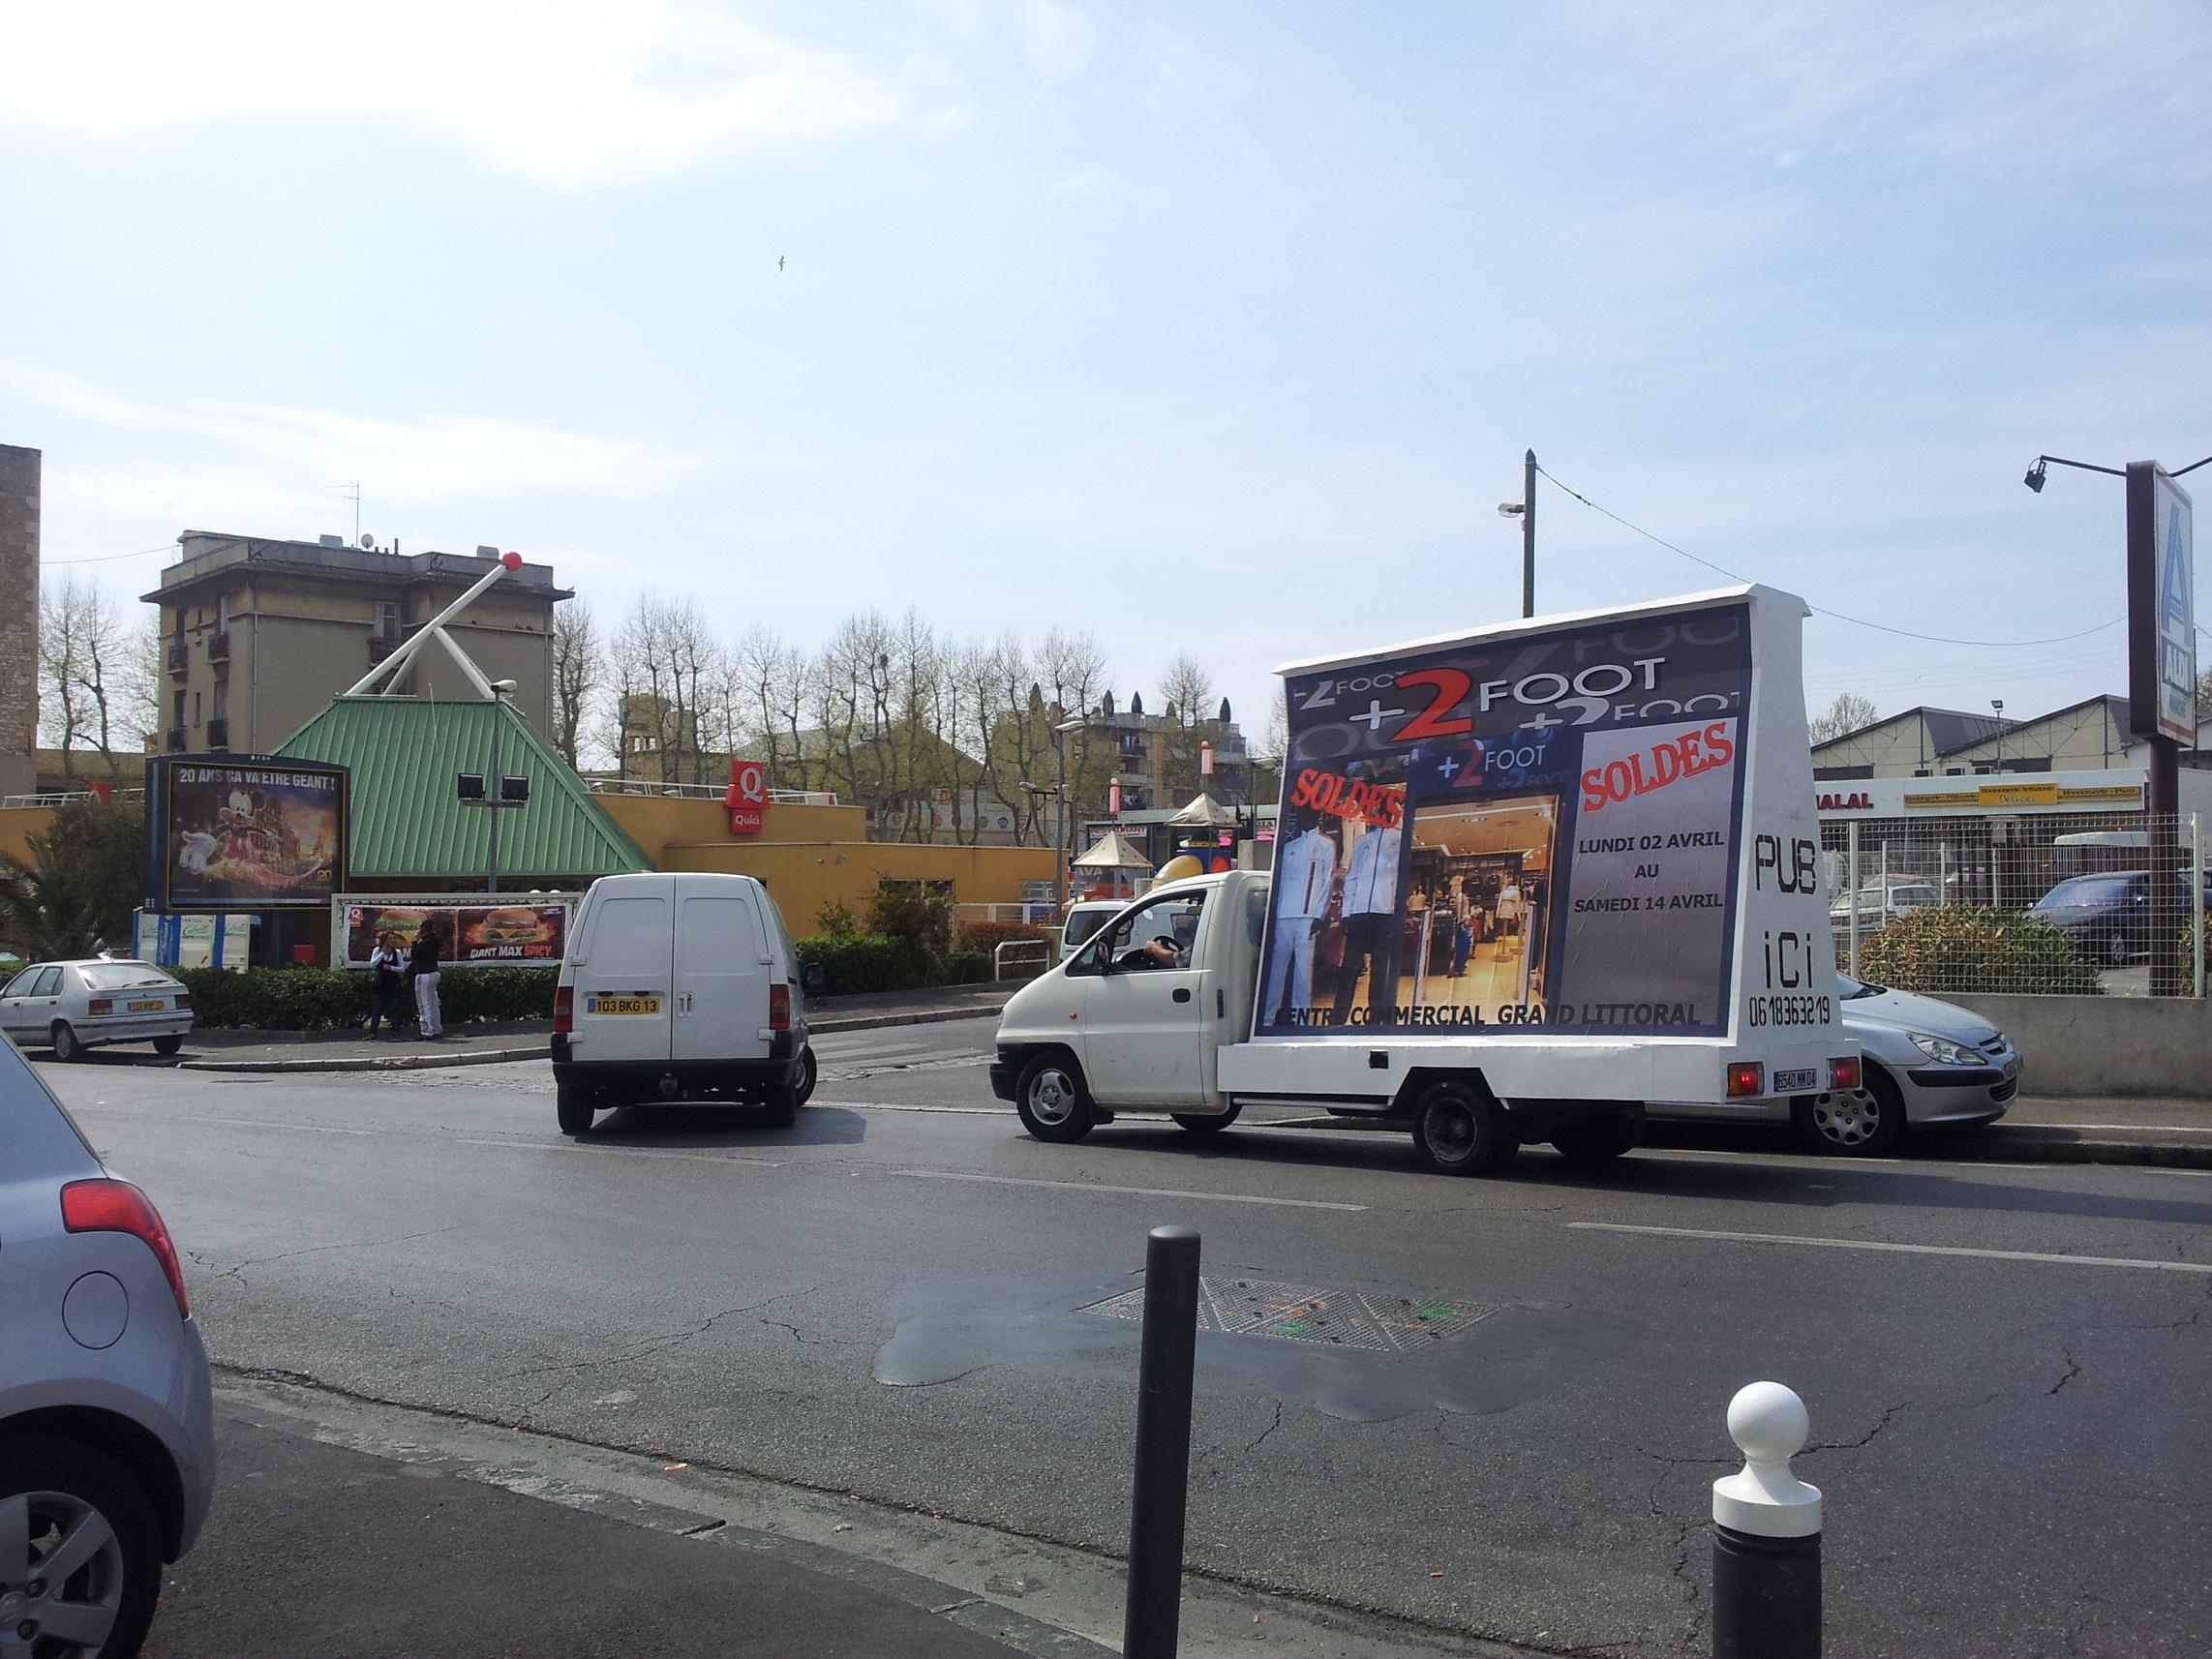 affichage mobile lyon camion publicitaire marseille street marketing. Black Bedroom Furniture Sets. Home Design Ideas